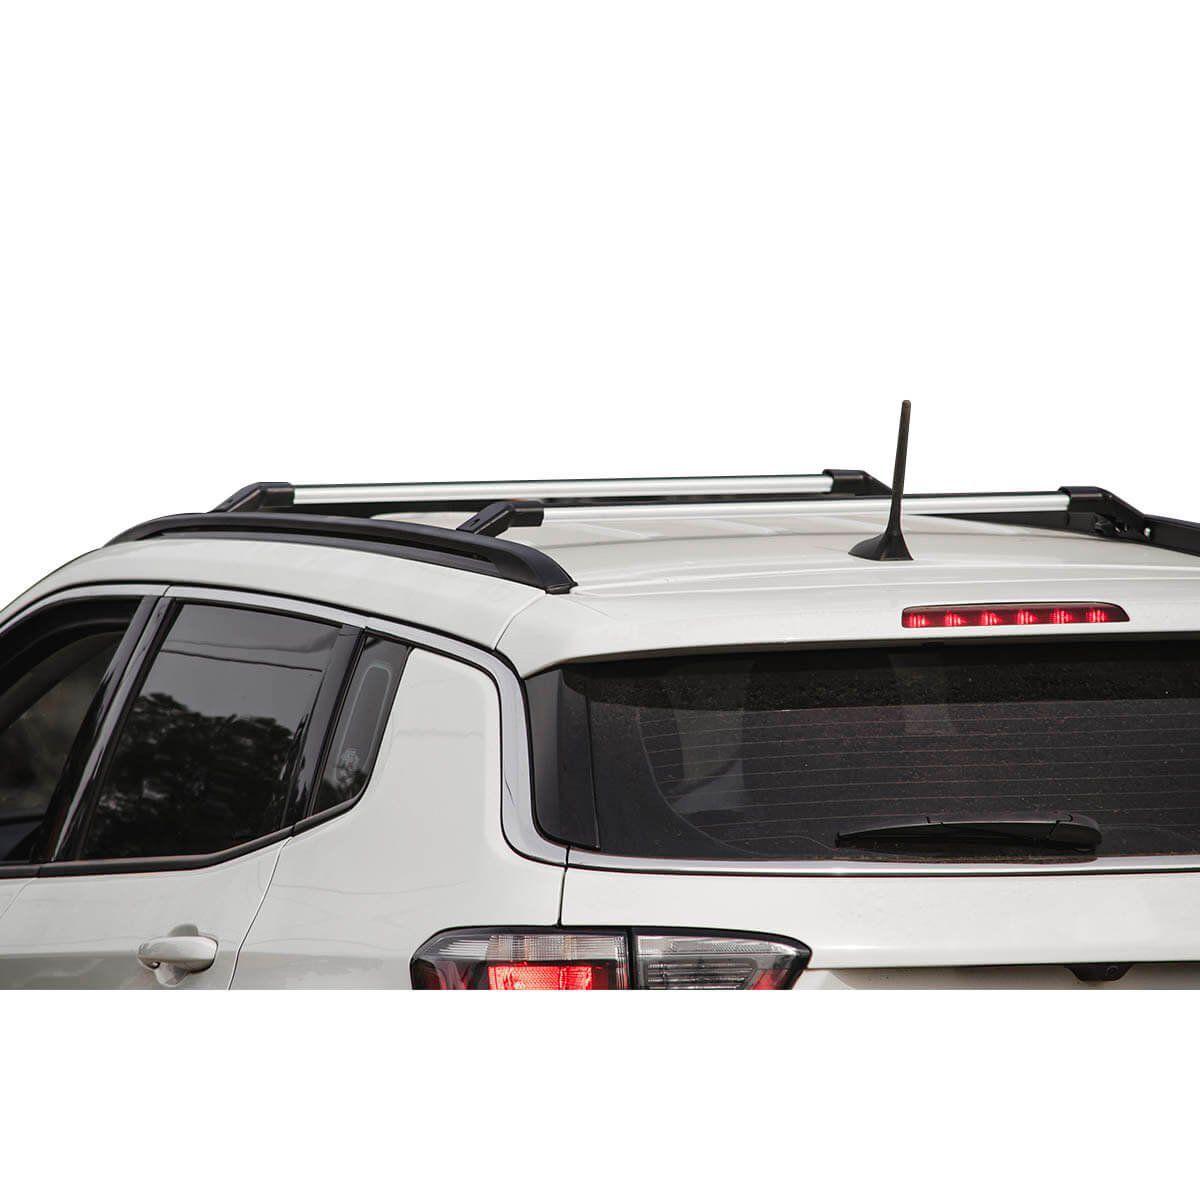 Travessa rack de teto Jeep Compass 2017 a 2021 larga anodizada